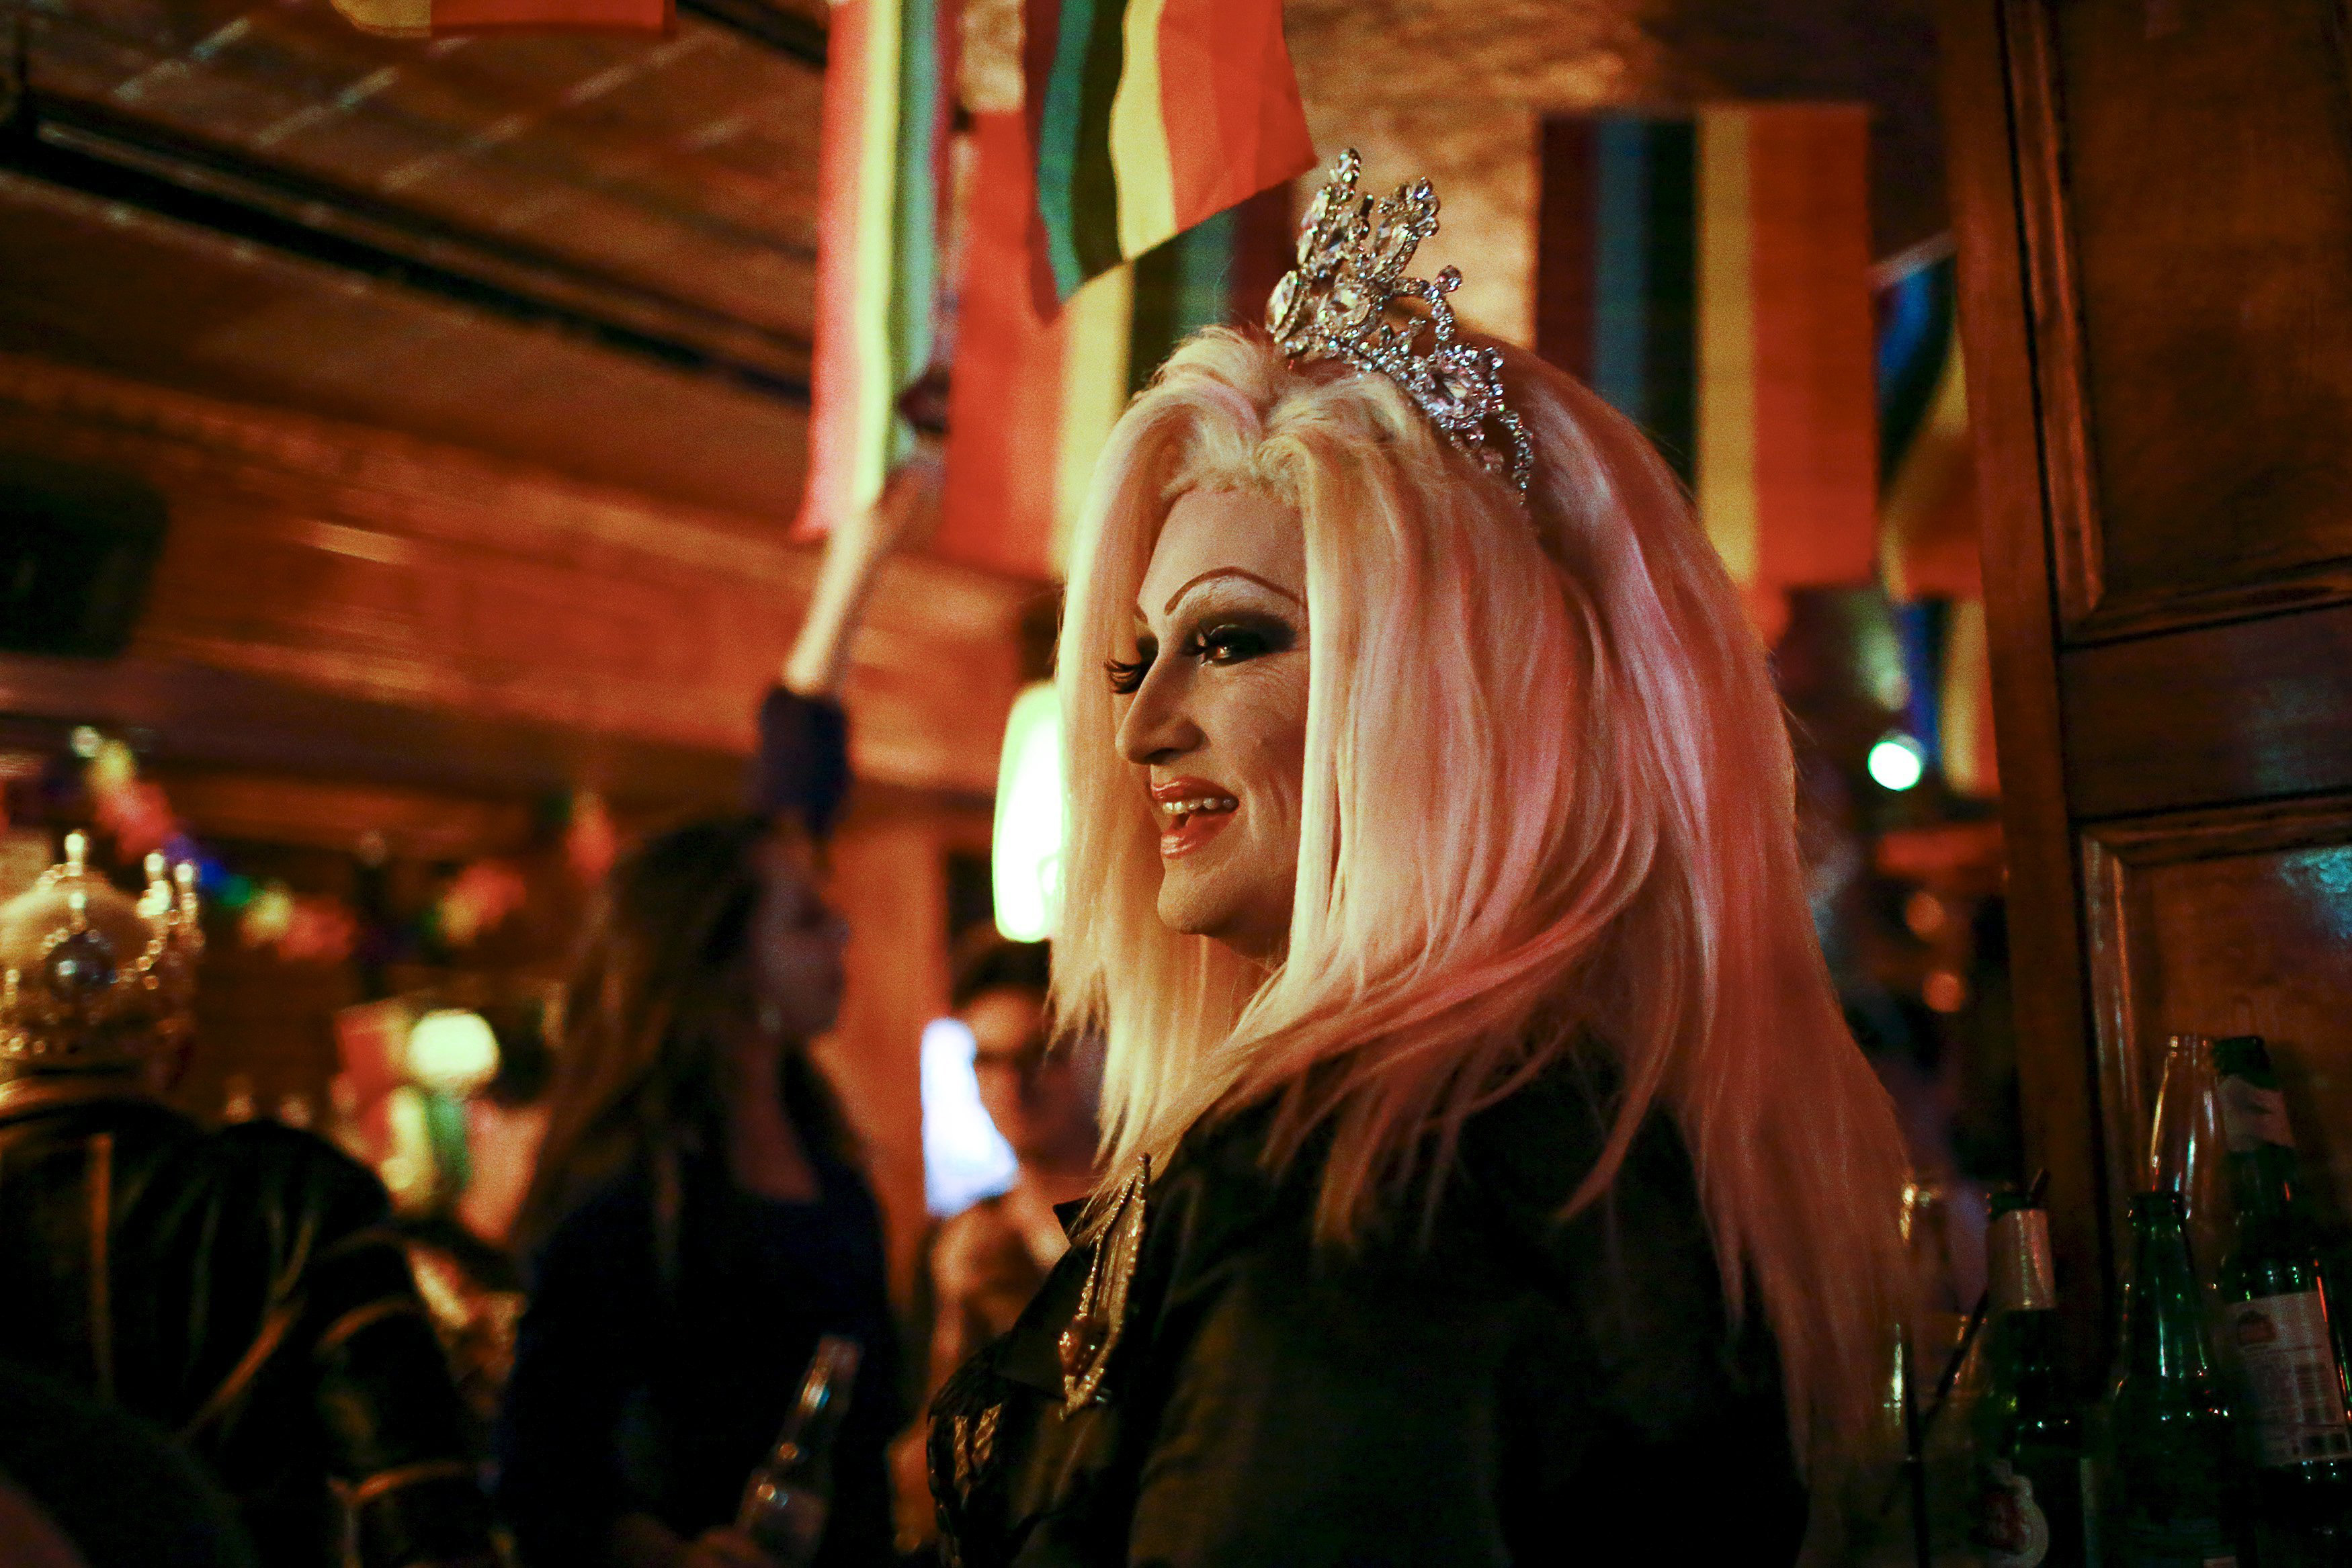 Empress XXIX Madison Mansfield celebrates inside the Stonewall Inn in the West Village neighborhood of New York June 26, 2015.